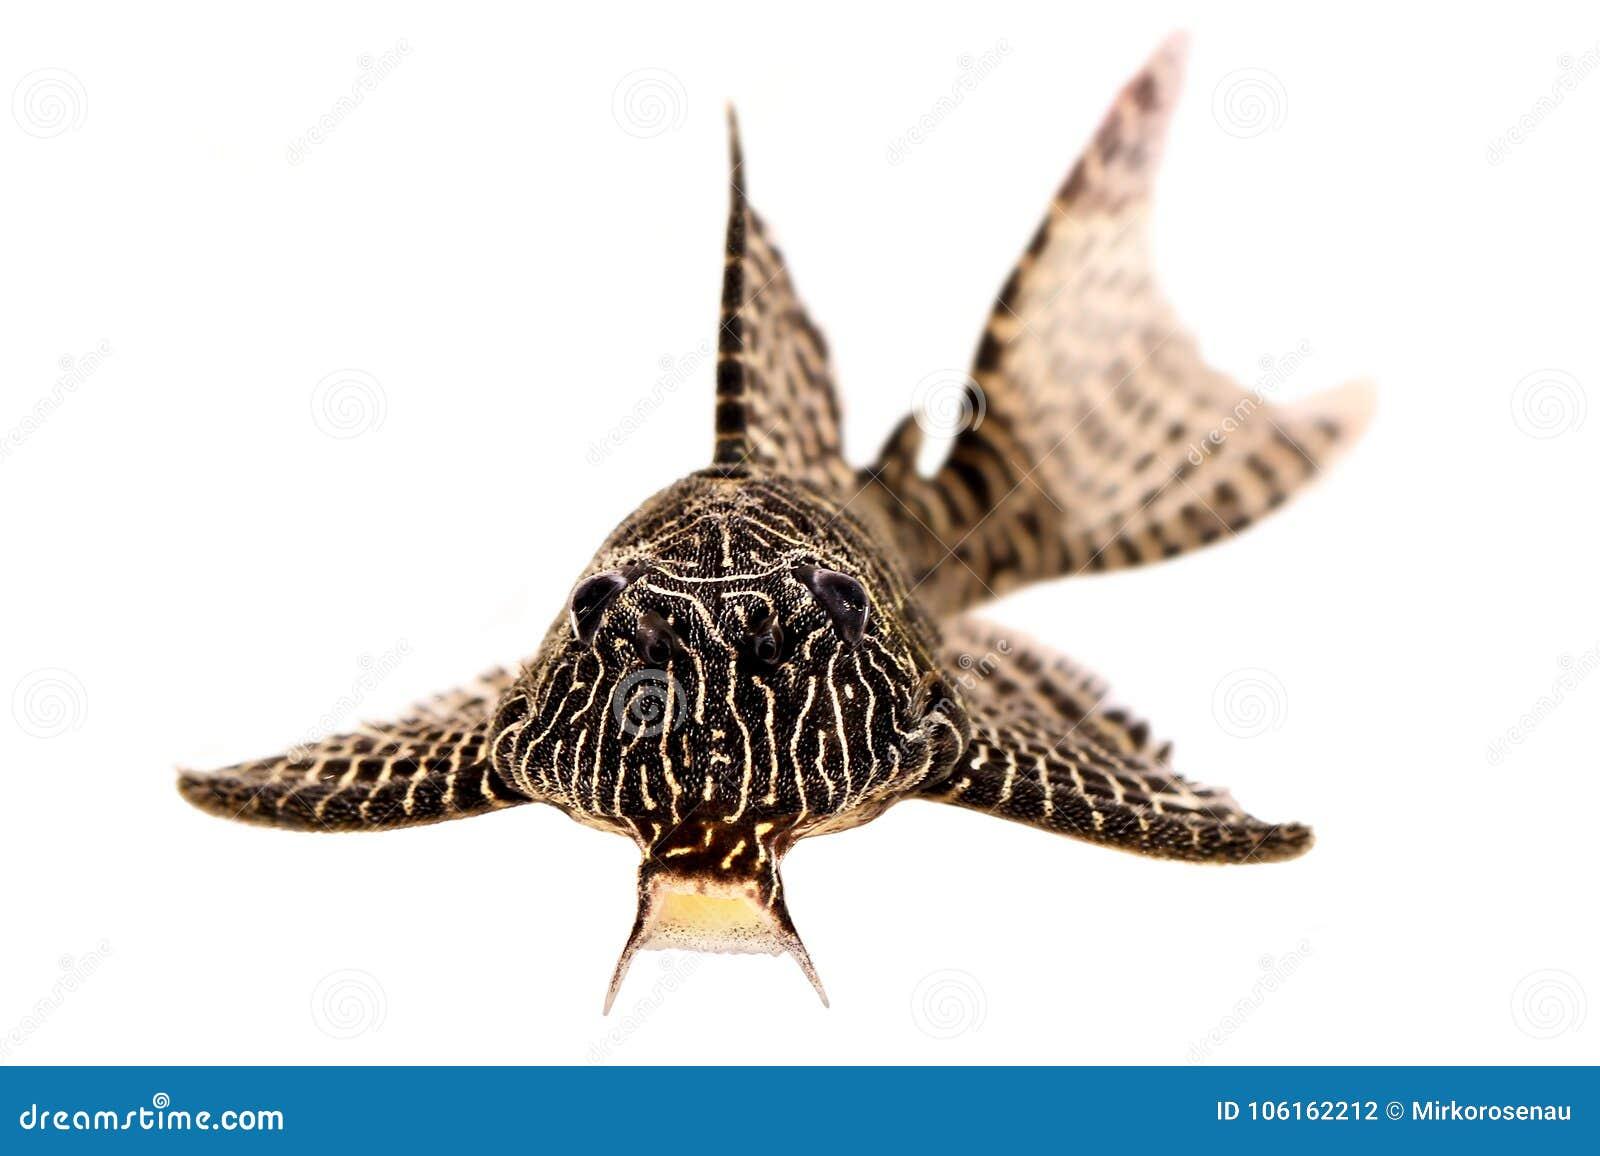 Pleco鲶鱼L-260女王蔓藤花纹Hypostomus sp Plecostomus水族馆鱼